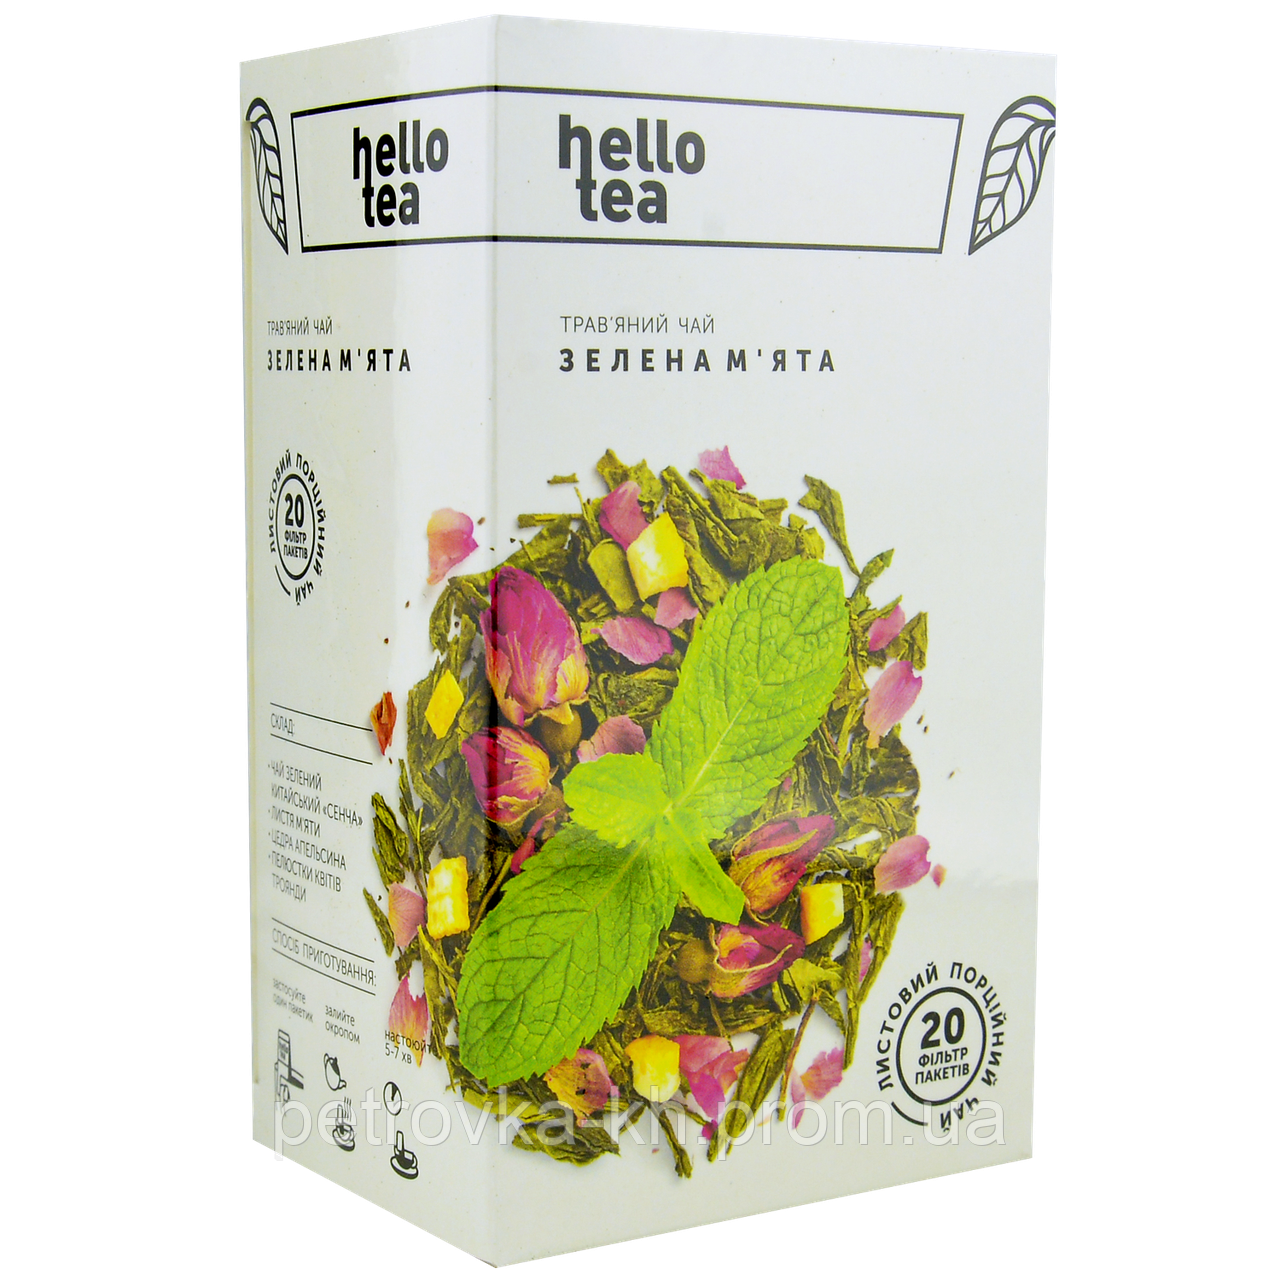 Чай Hello tea Mint green  (1уп/20шт) Мята